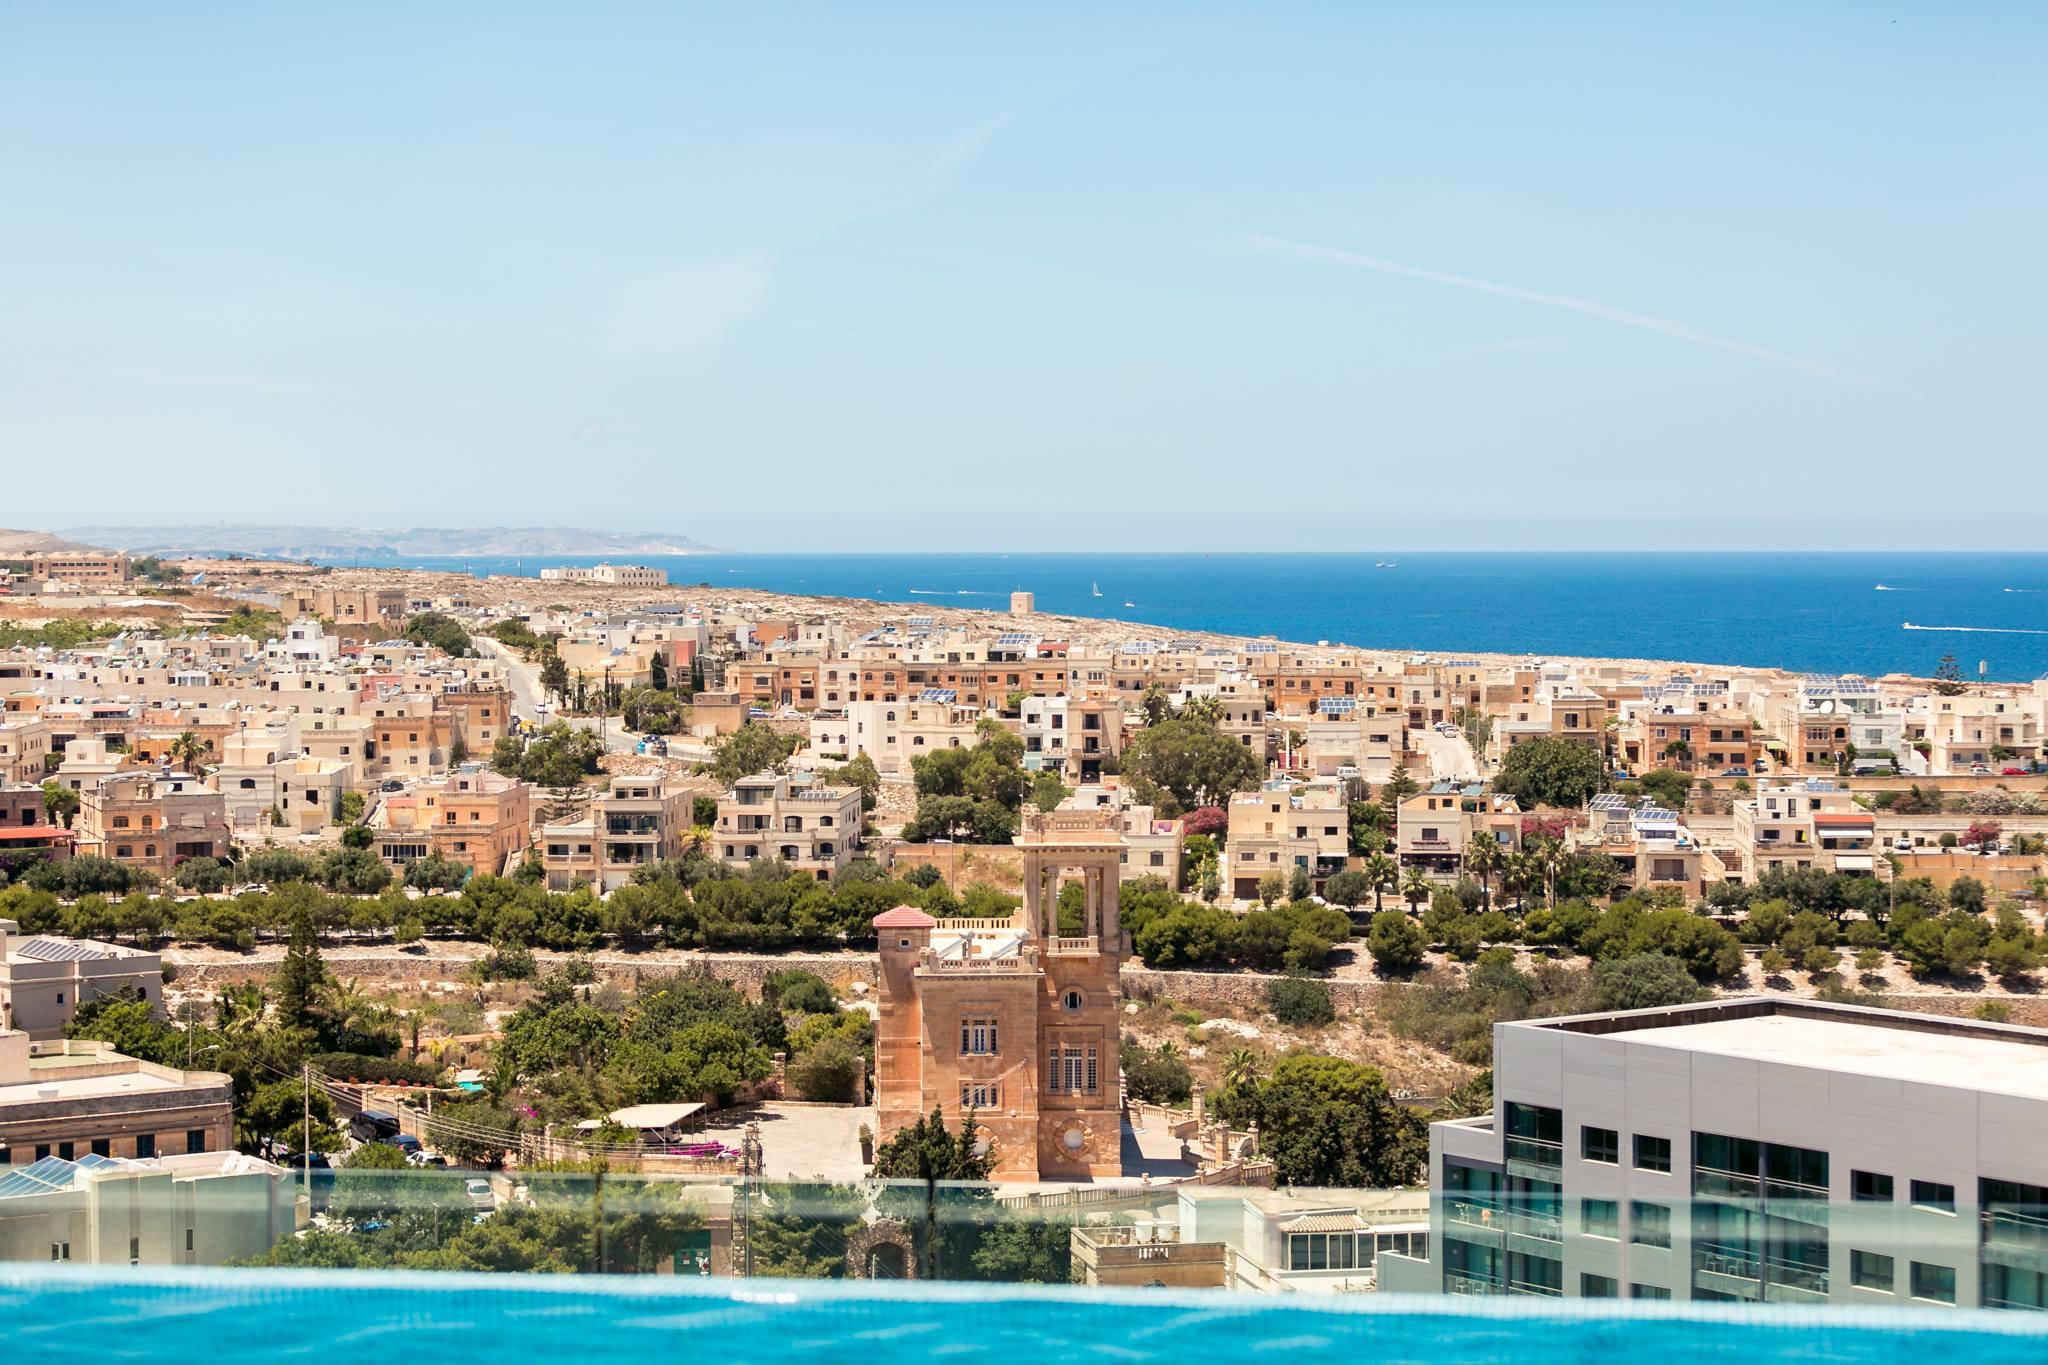 IMS College and exploring Malta as a rising clubbing destination